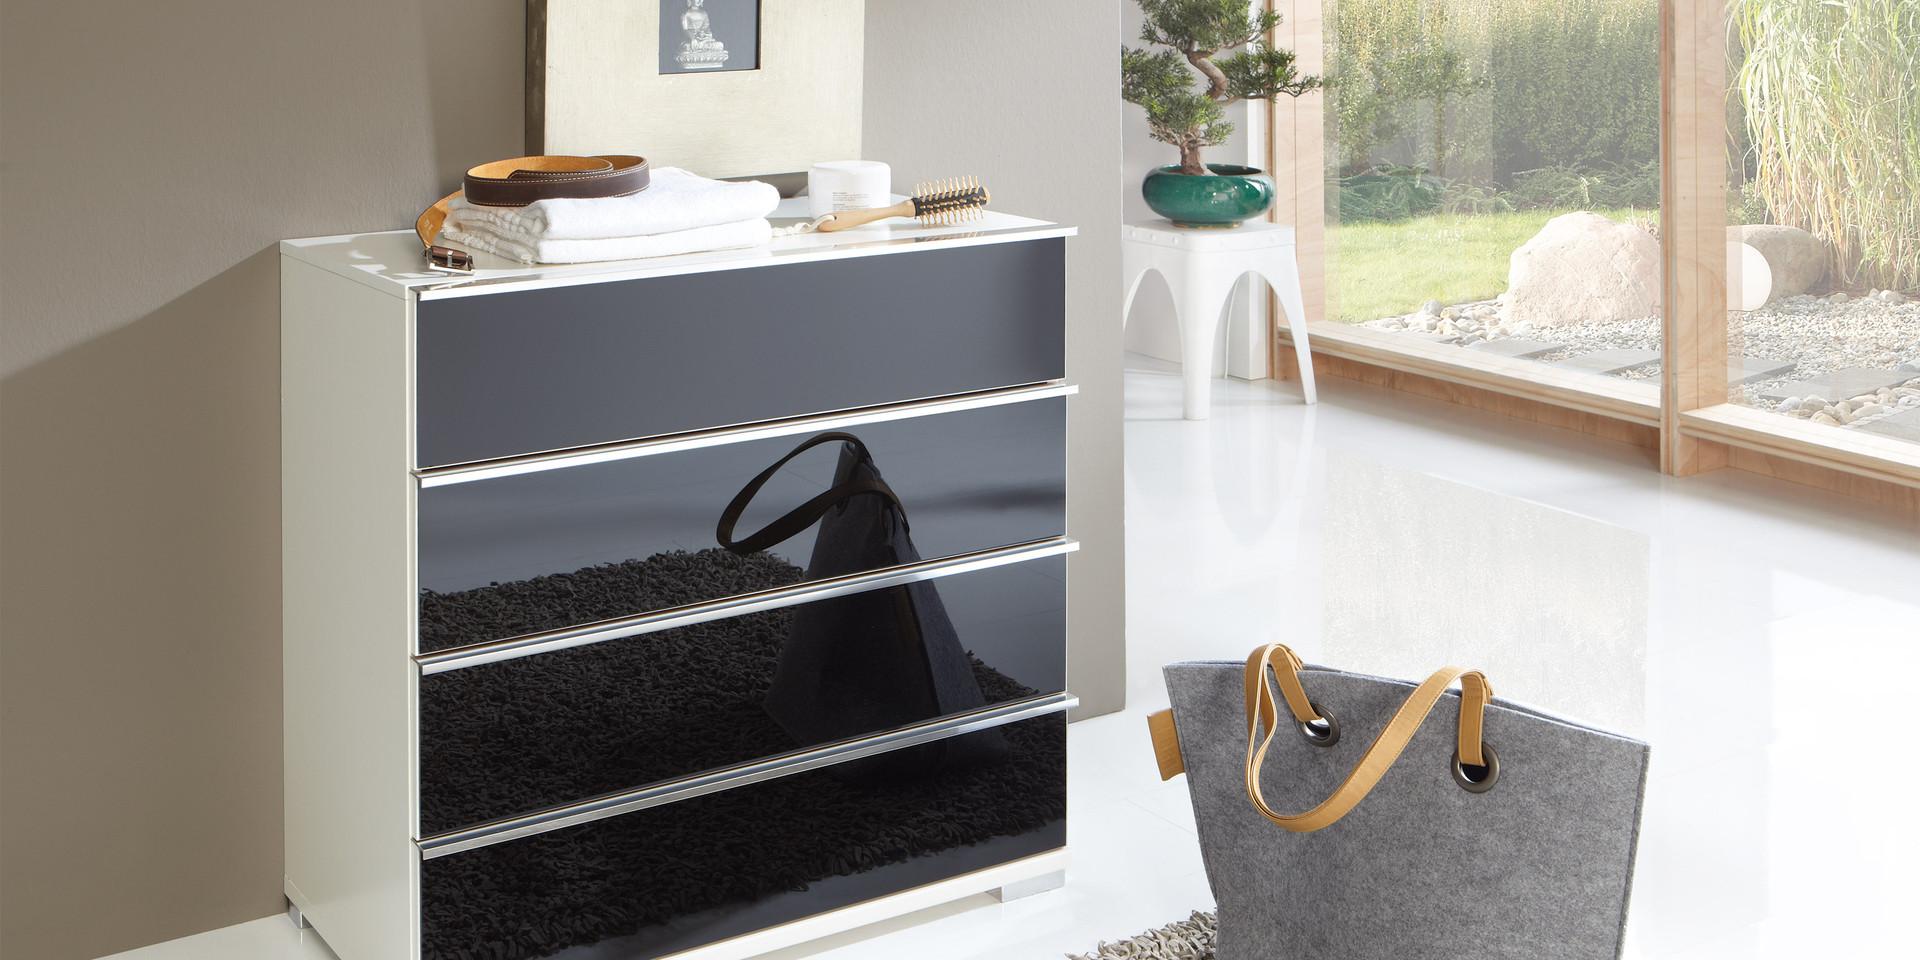 kommode schlafzimmer modern | möbelideen, Badezimmer